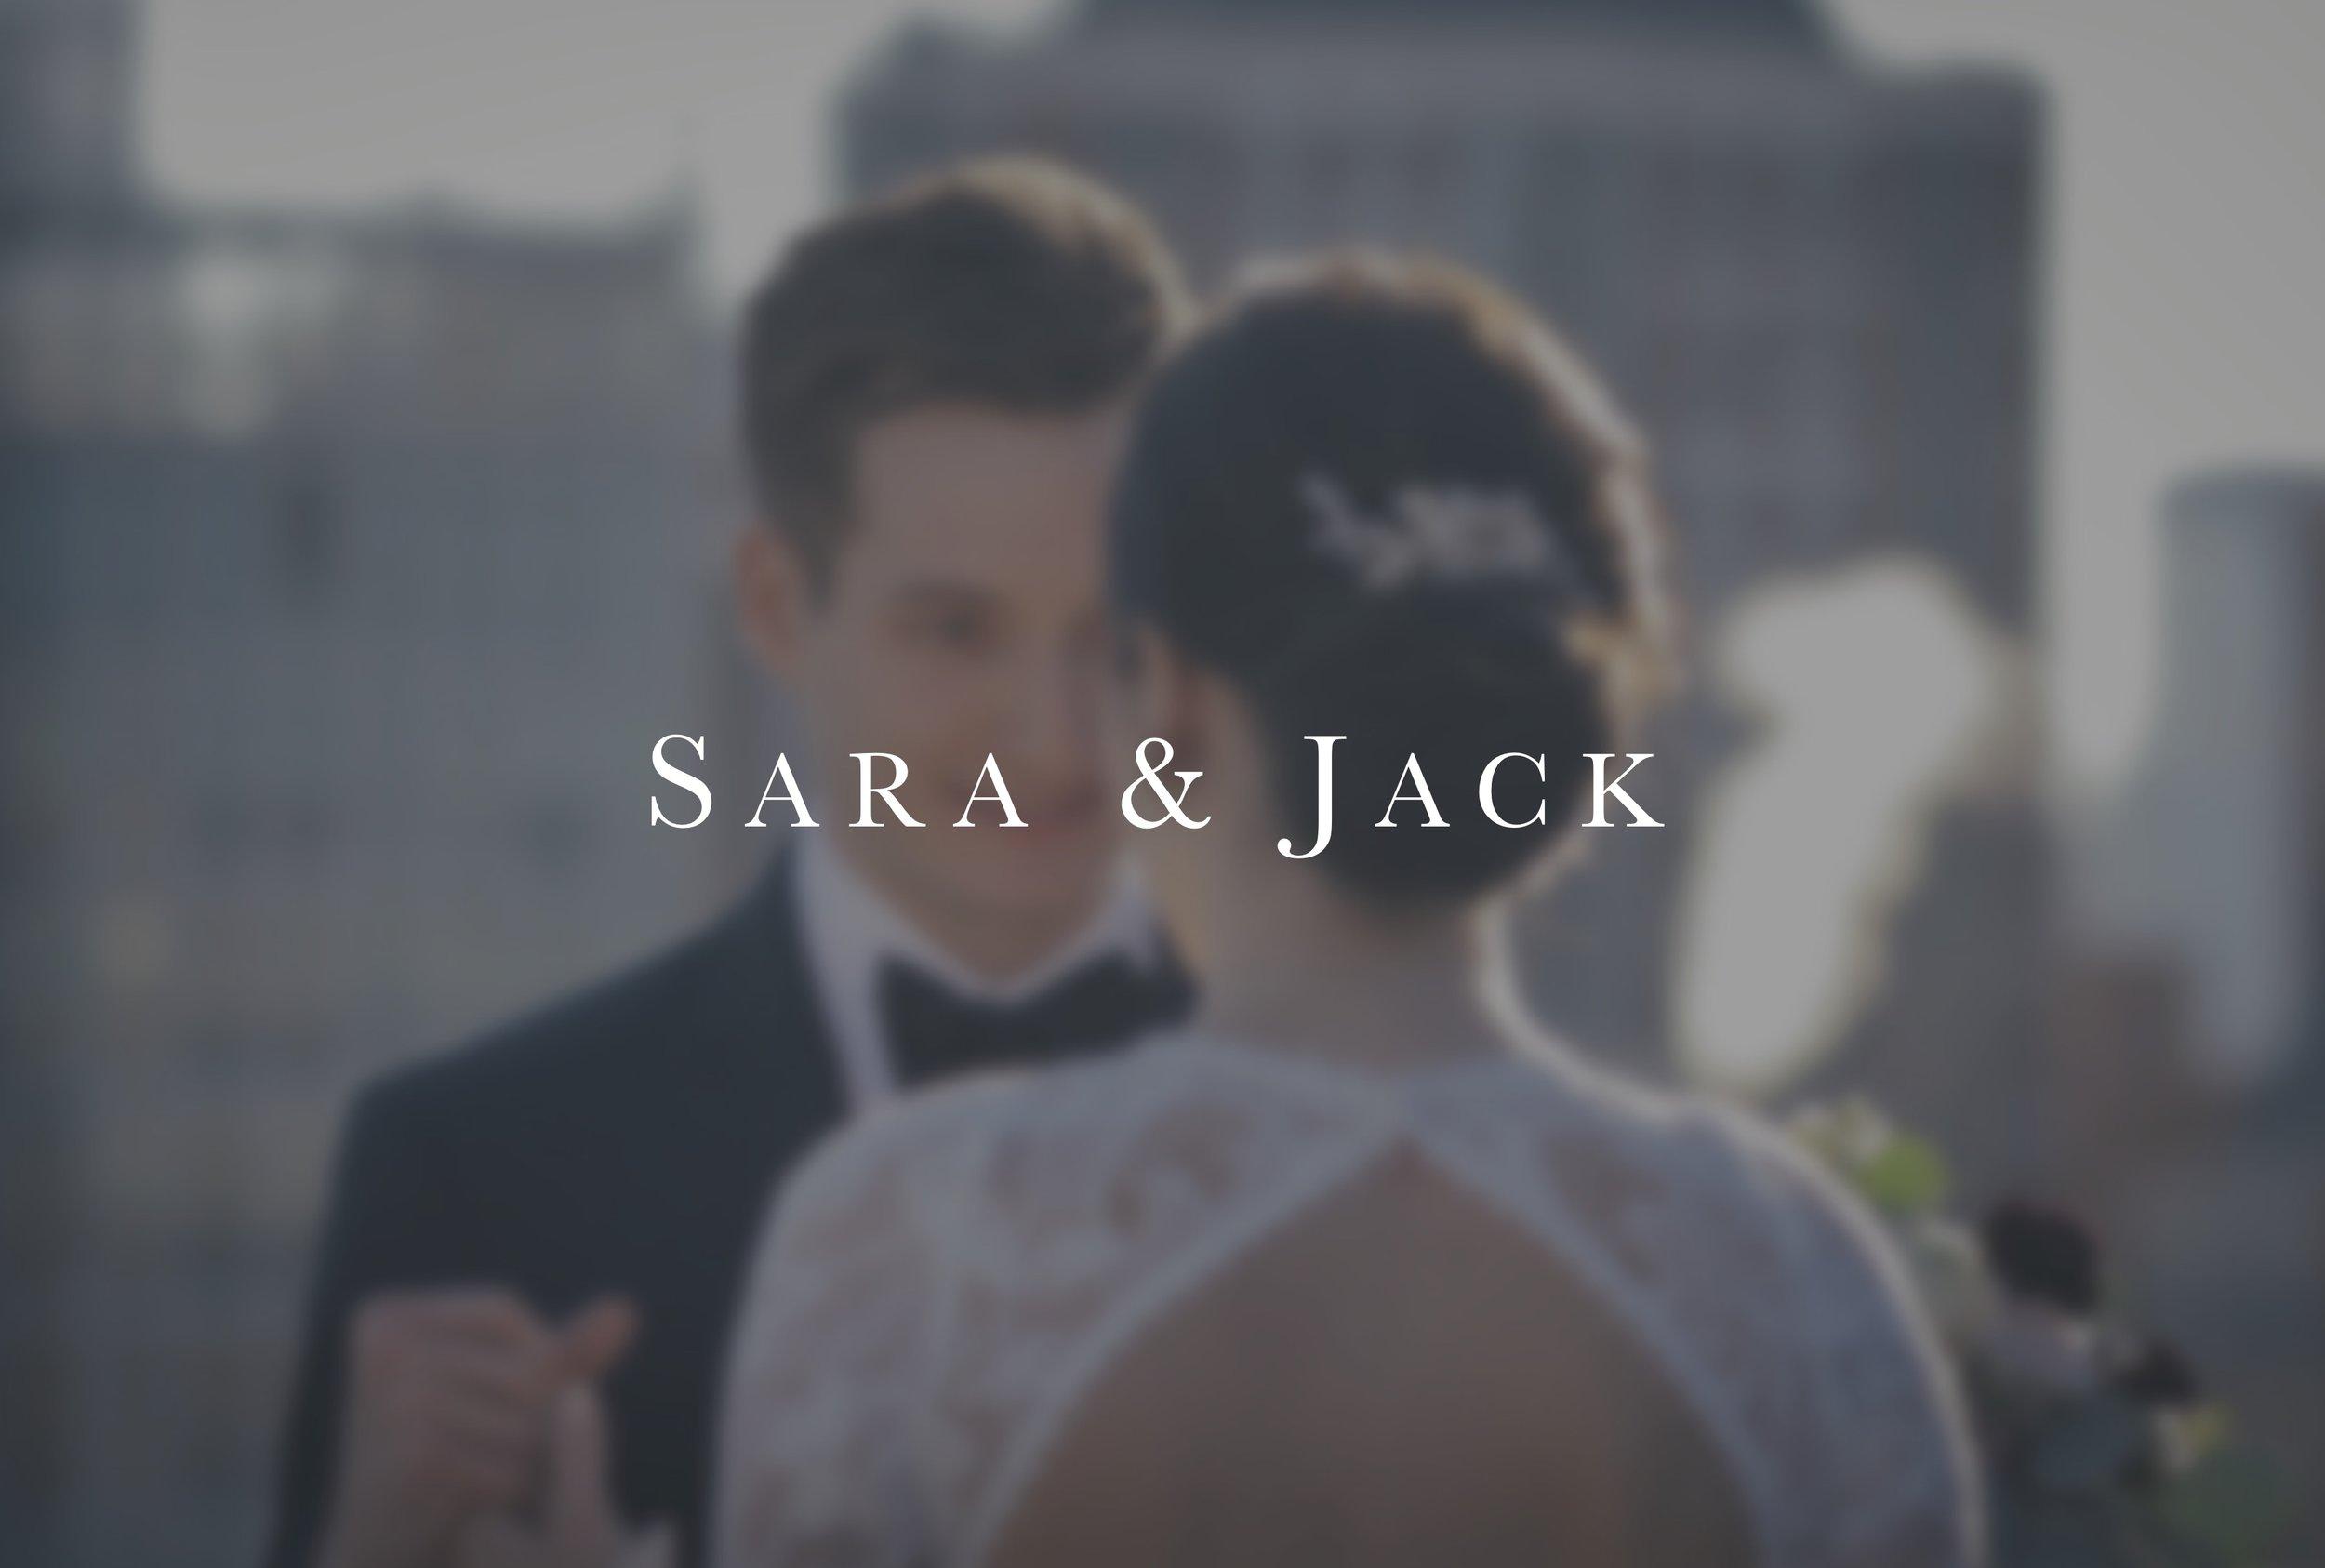 S&J Title.jpg